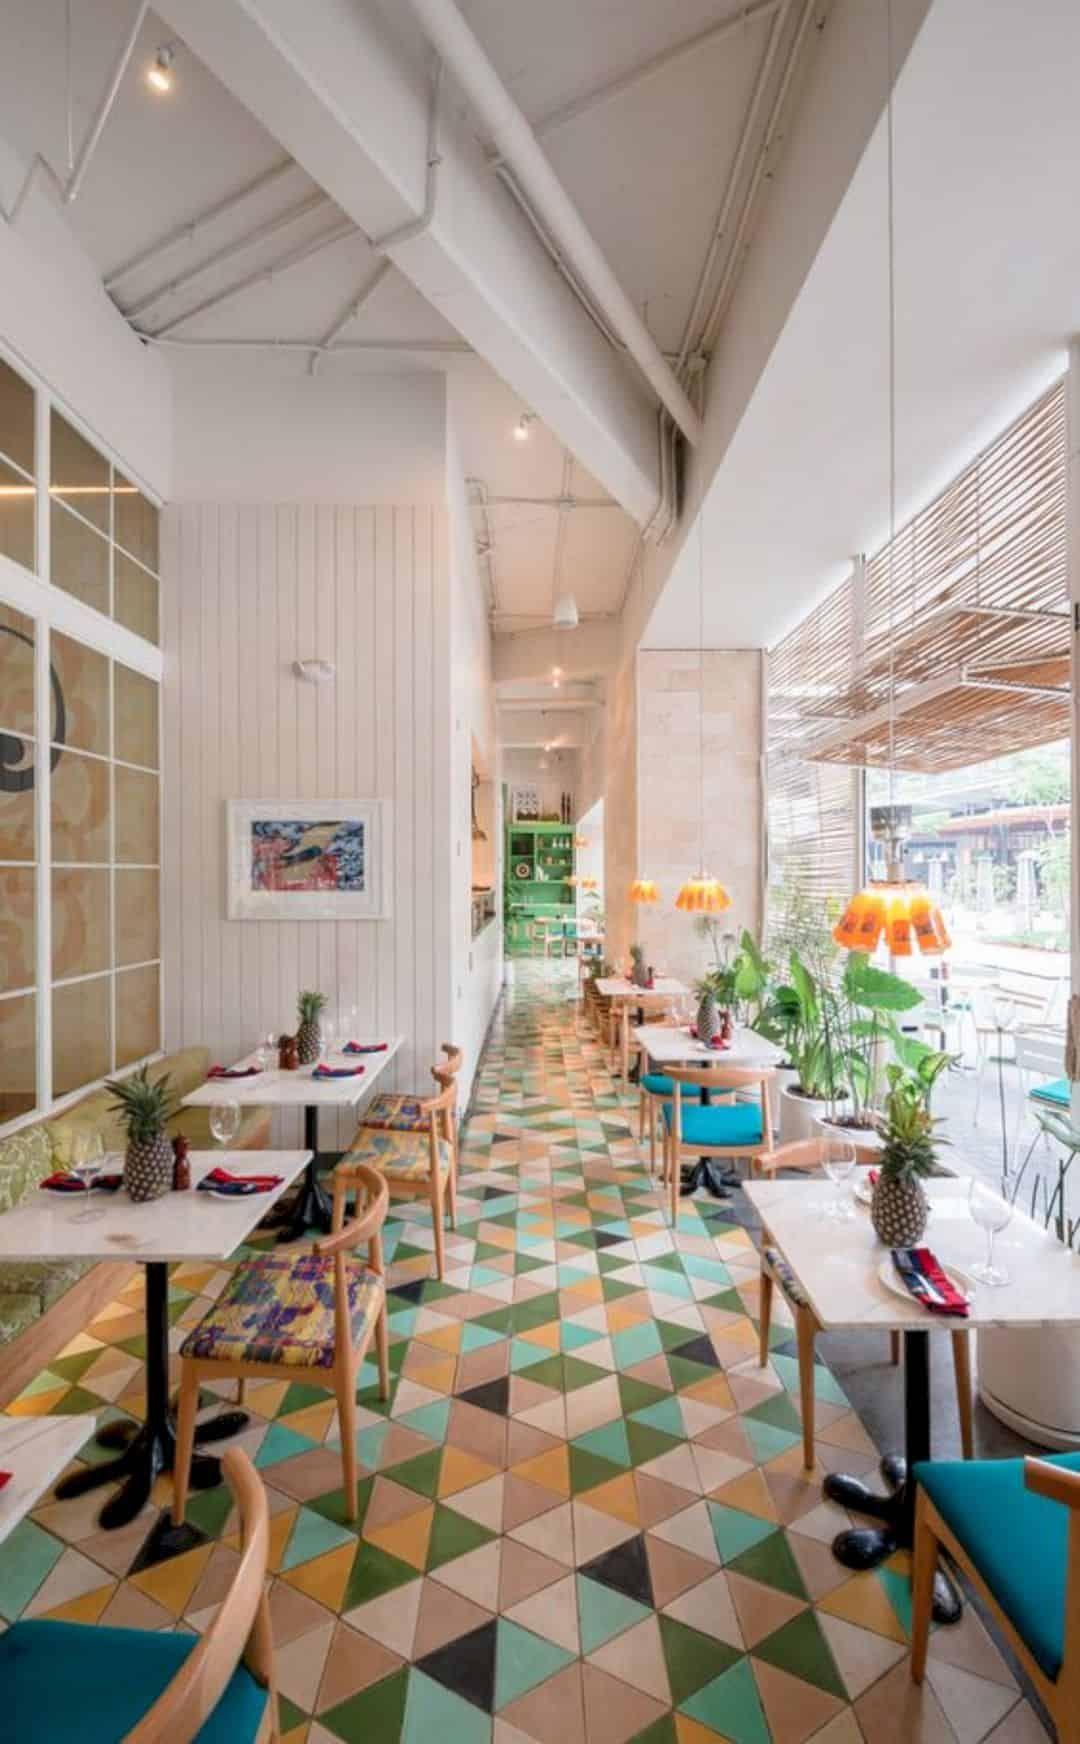 15 Great Interior Design Ideas for Small Restaurant | Futurist Architecture #smallrestaurants